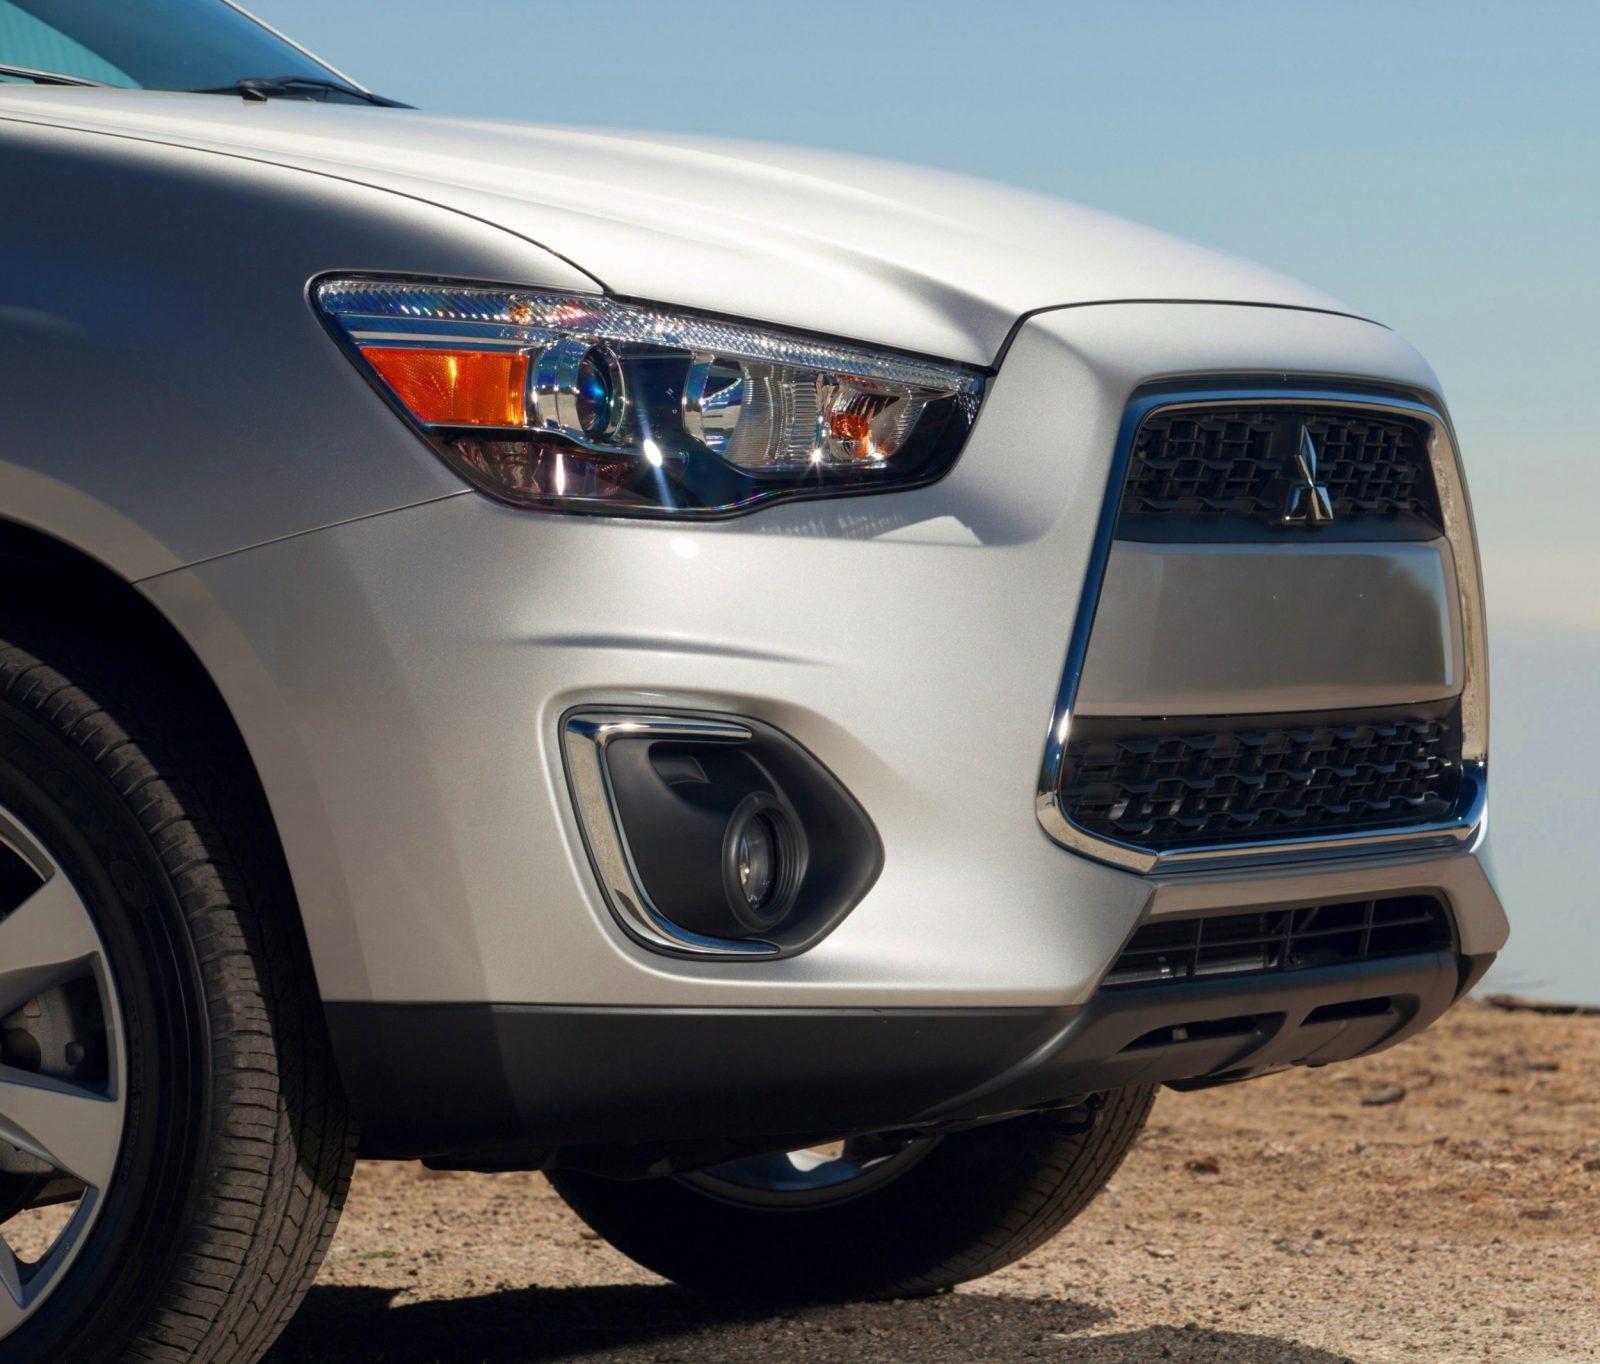 2014 Mitsubishi Outlander Sport From $19,470! Interior